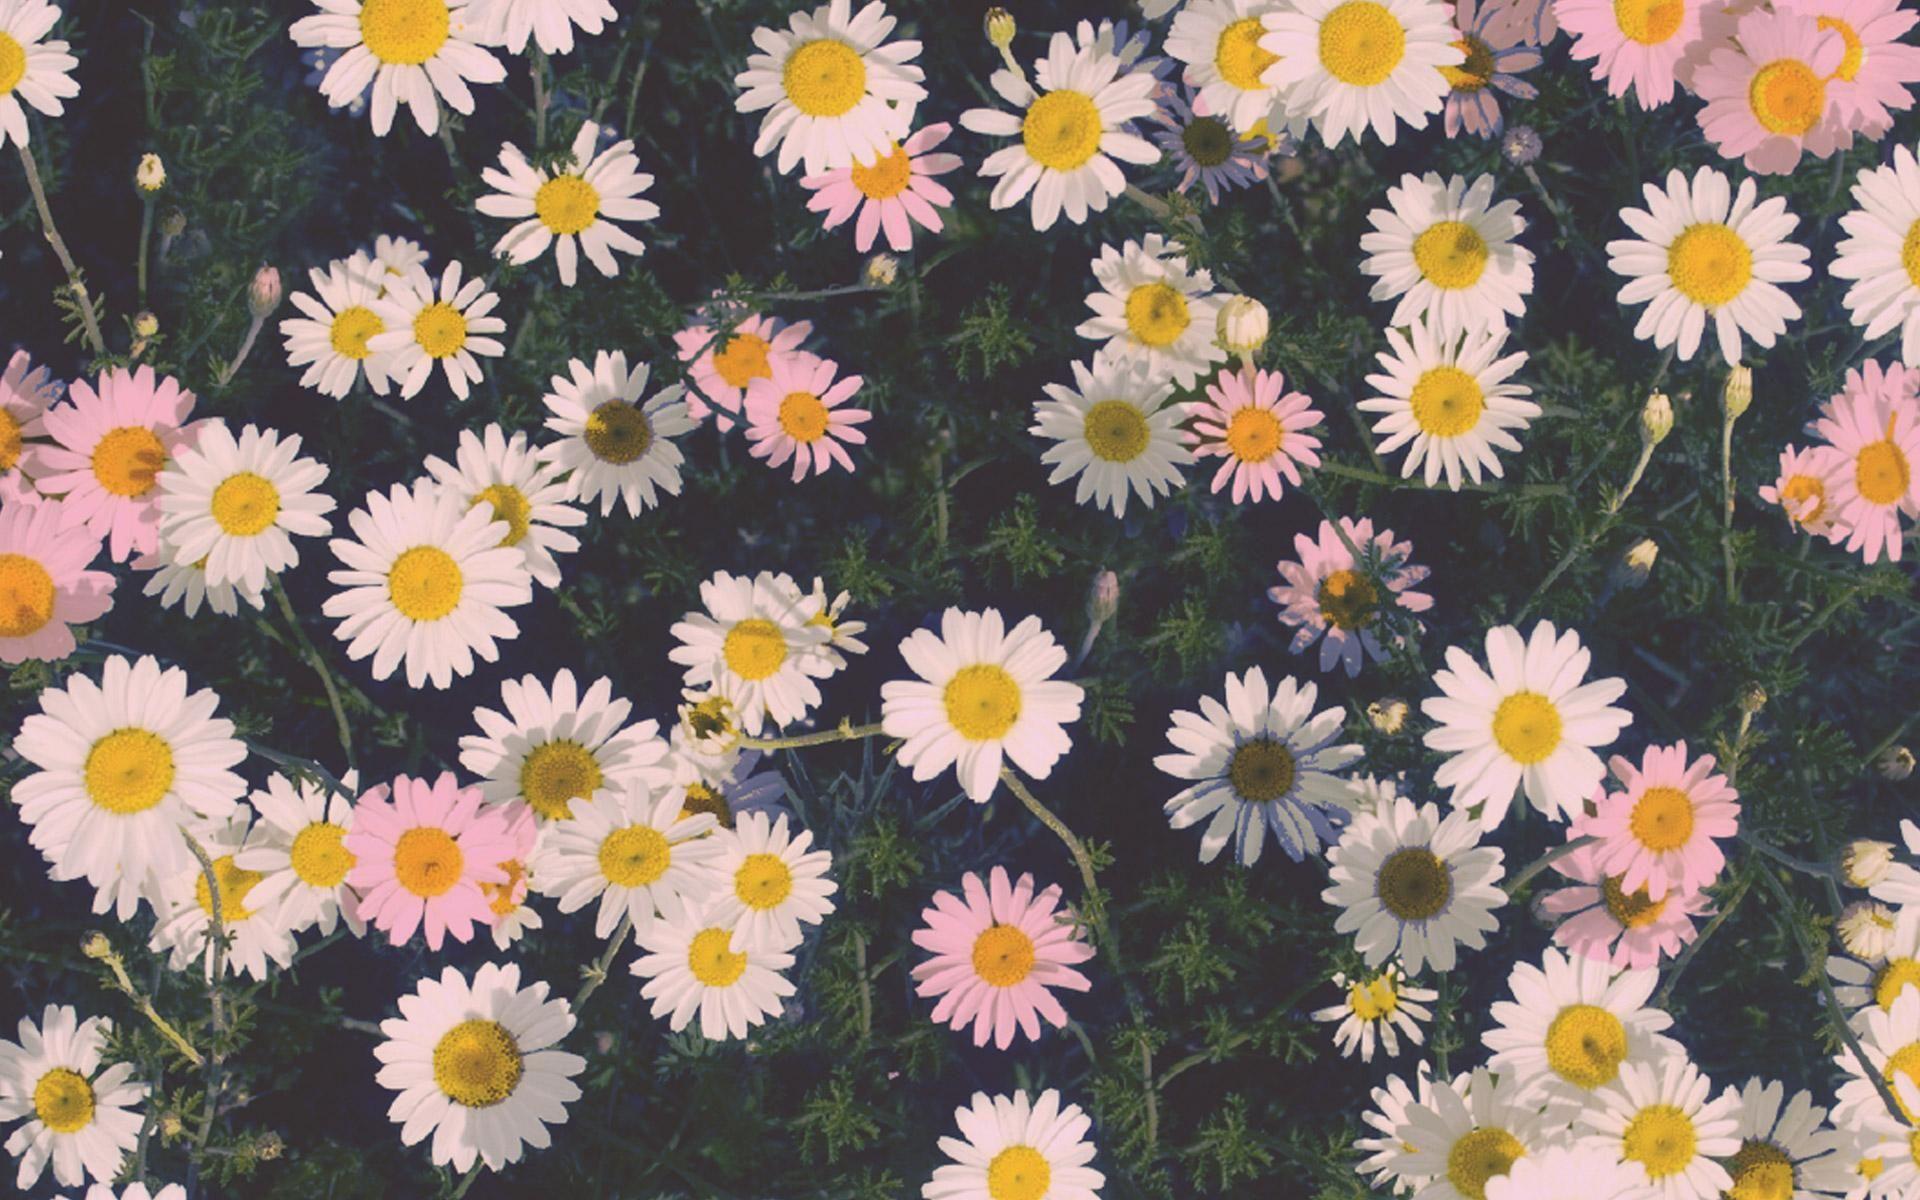 Aesthetics Image By Jessica ▽